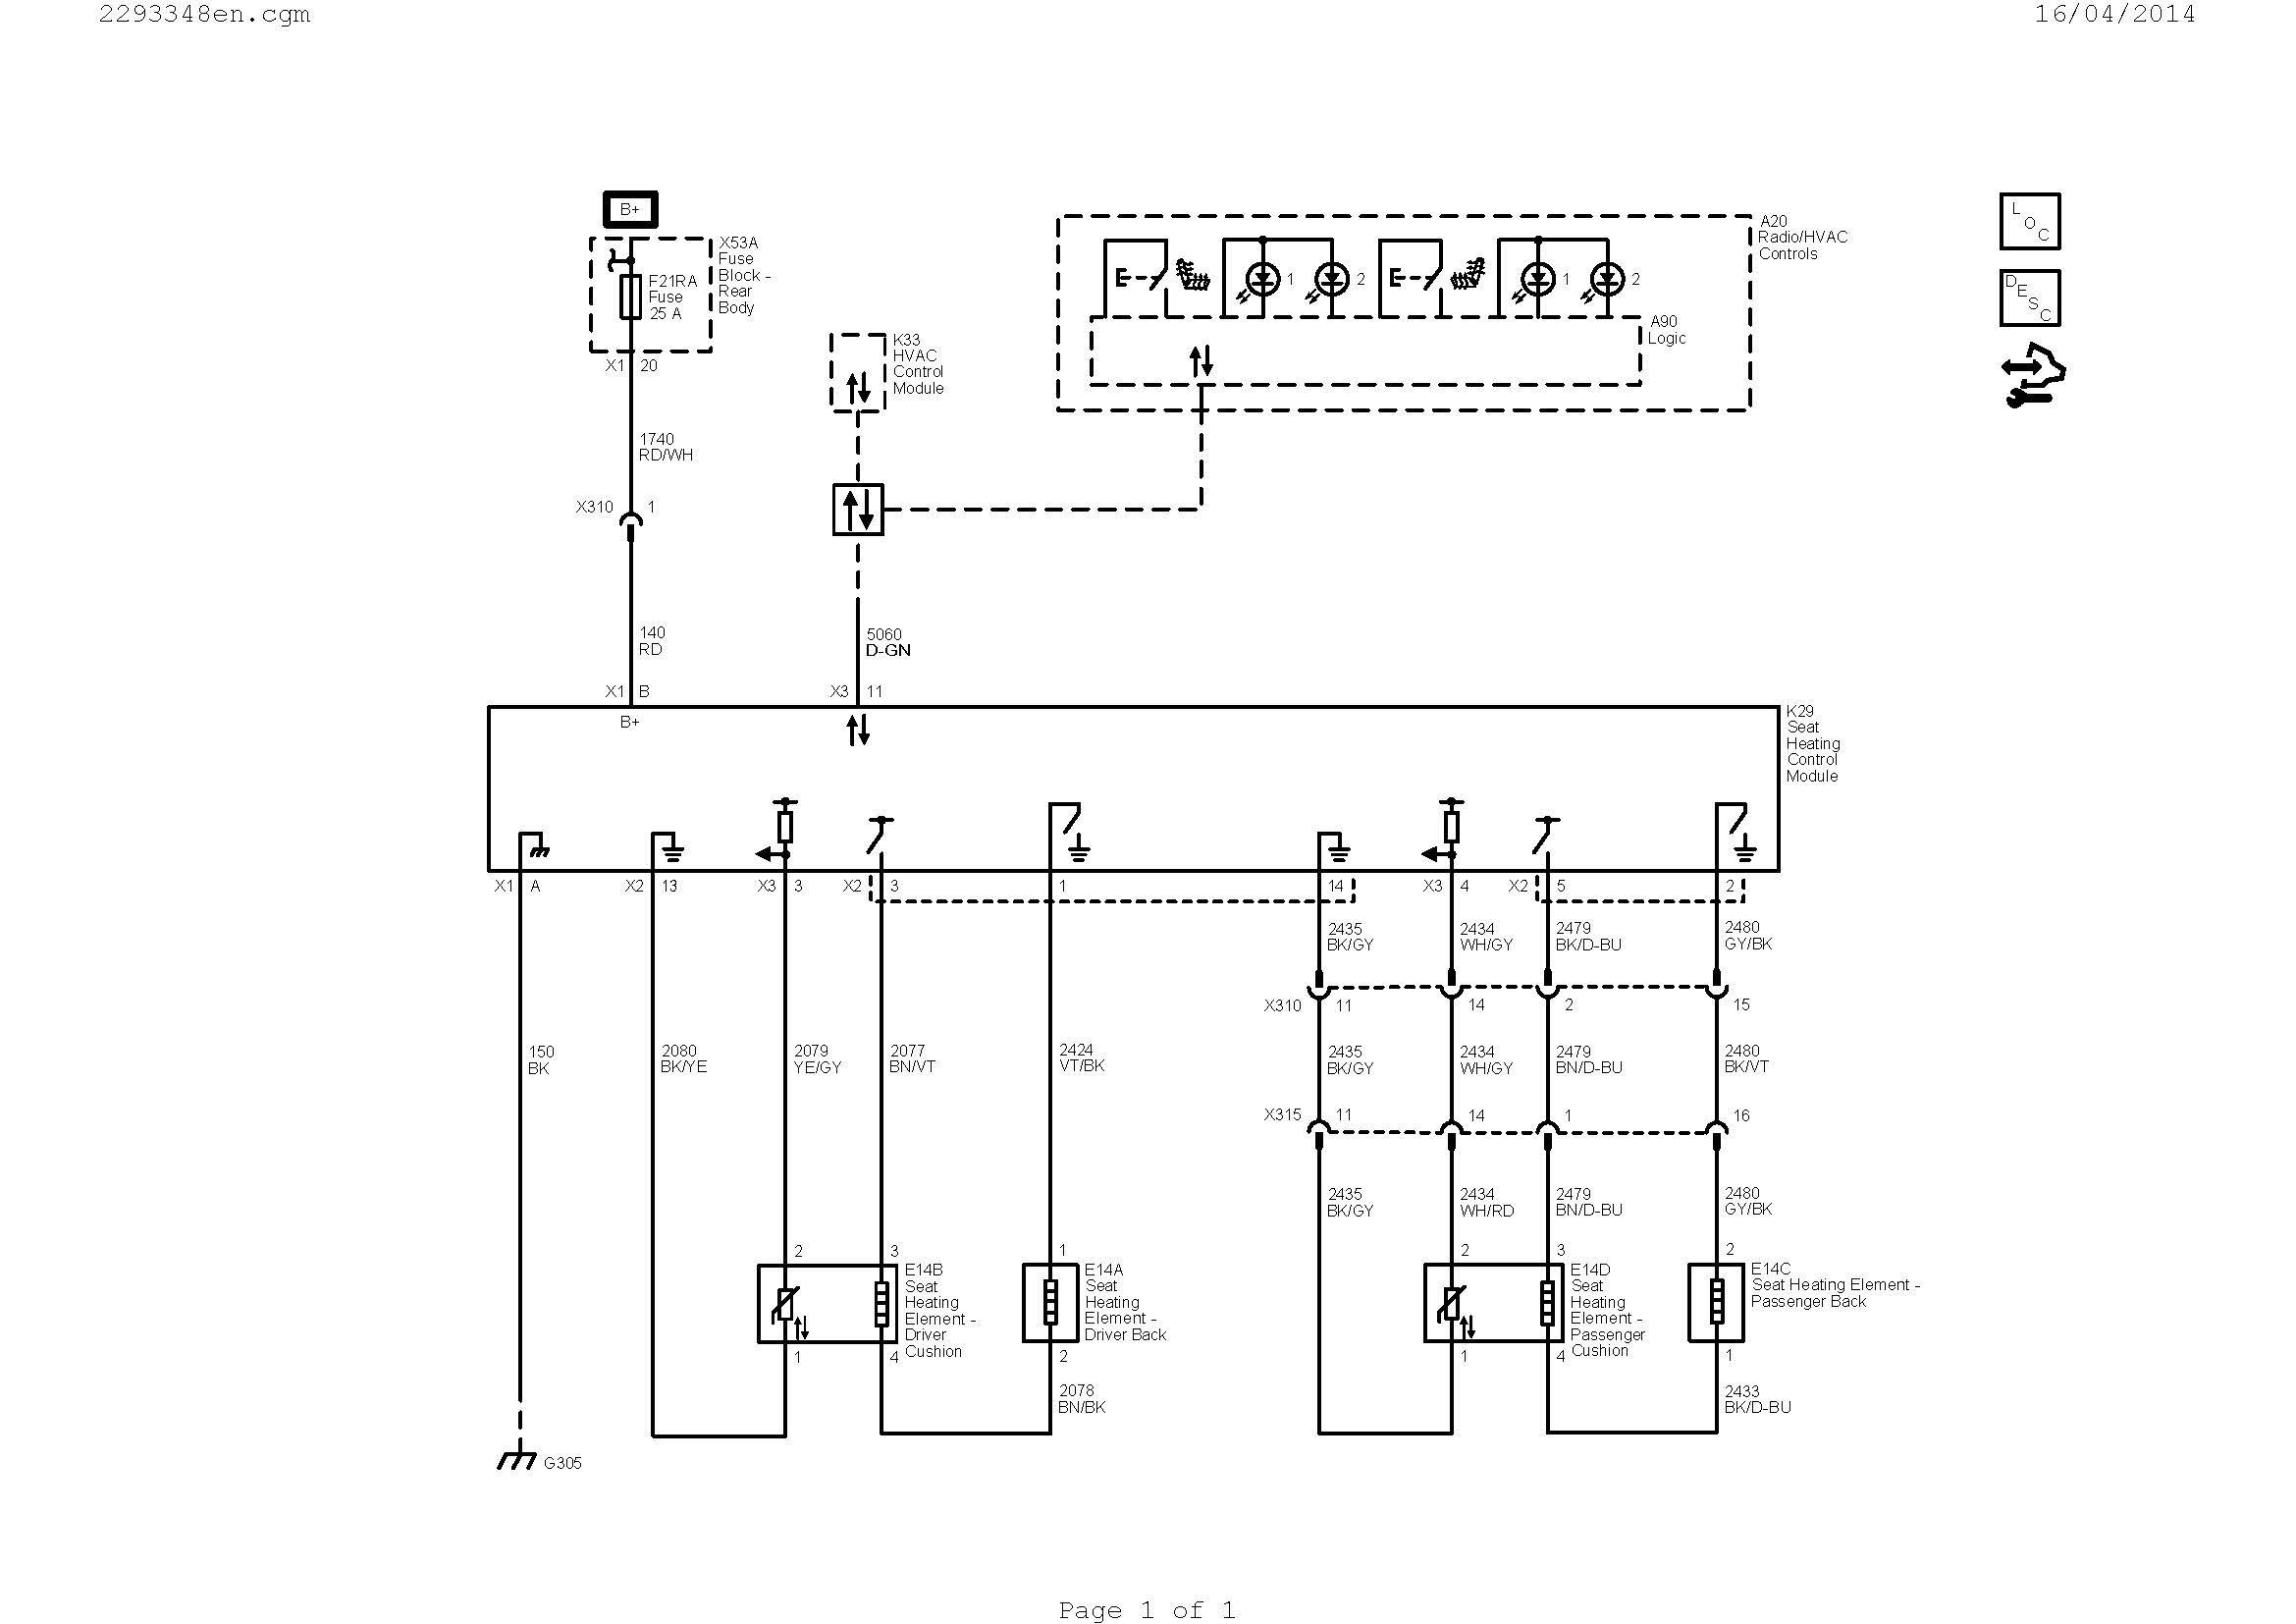 White Rodgers 50E47 843 Wiring Diagram | Schematic Diagram - White Rodgers Gas Valve Wiring Diagram